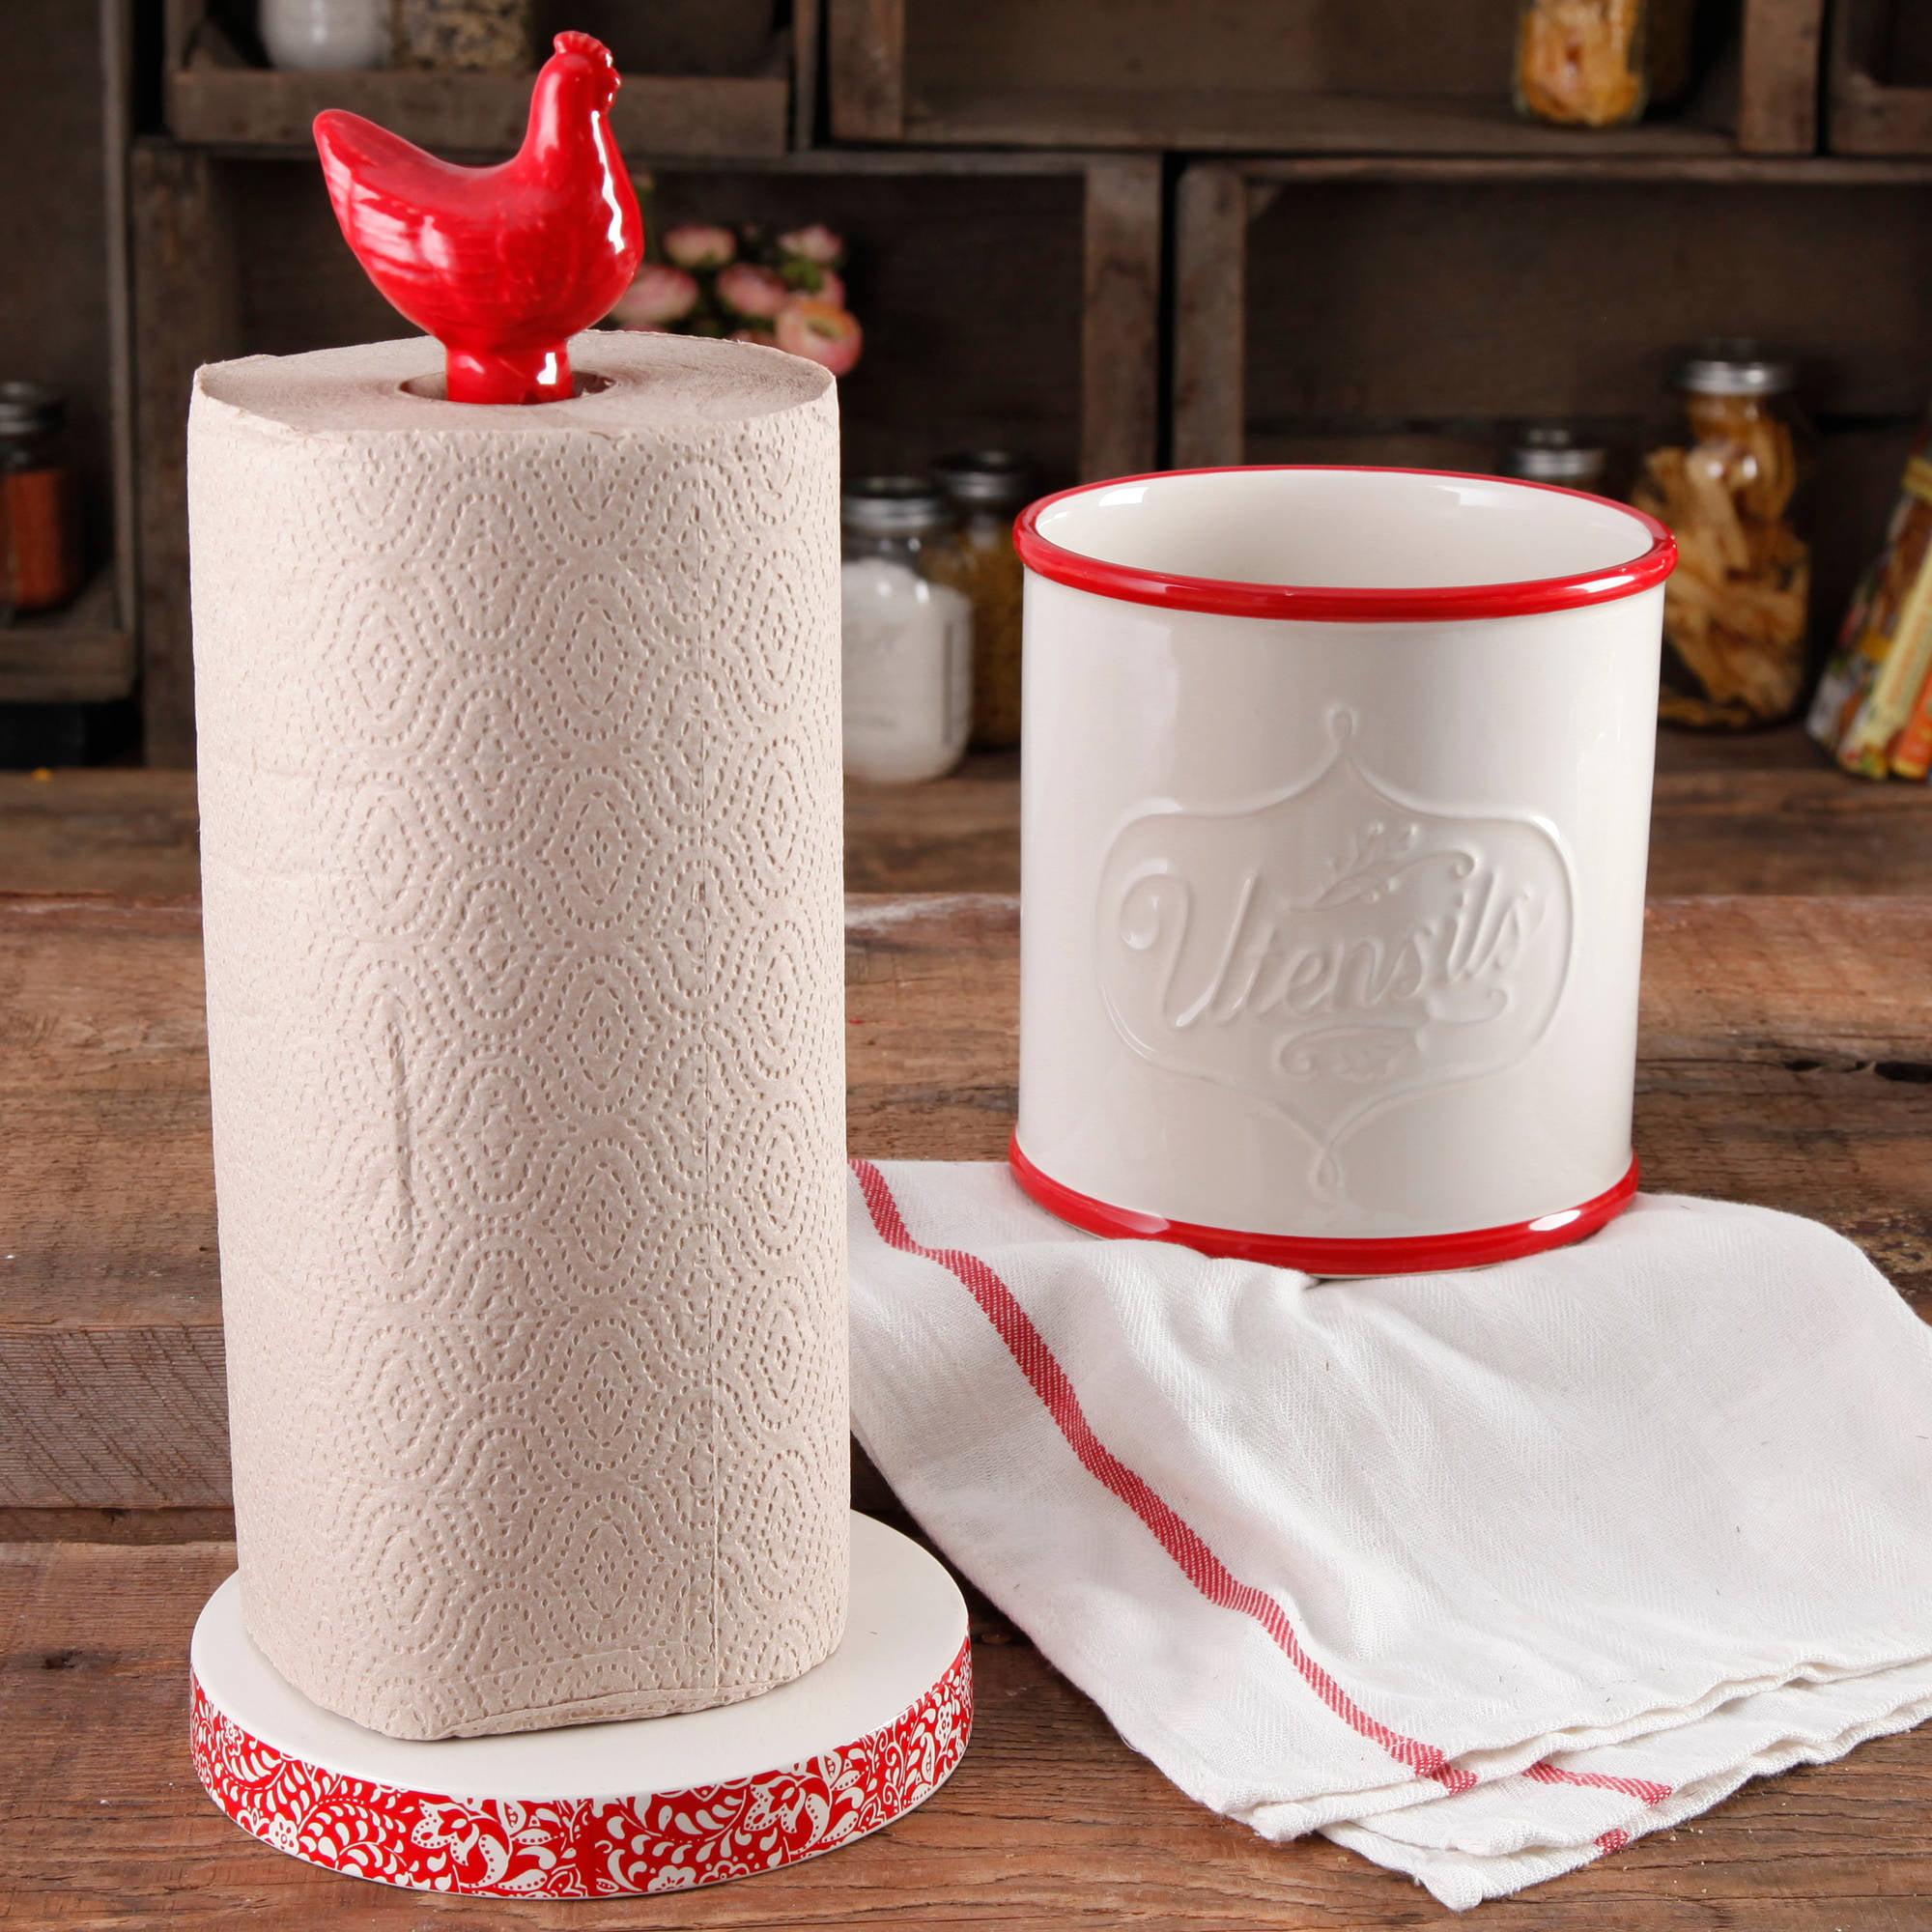 The Pioneer Woman Flea Market Stoneware Red Paper Towel Holder And Crock    Walmart.com